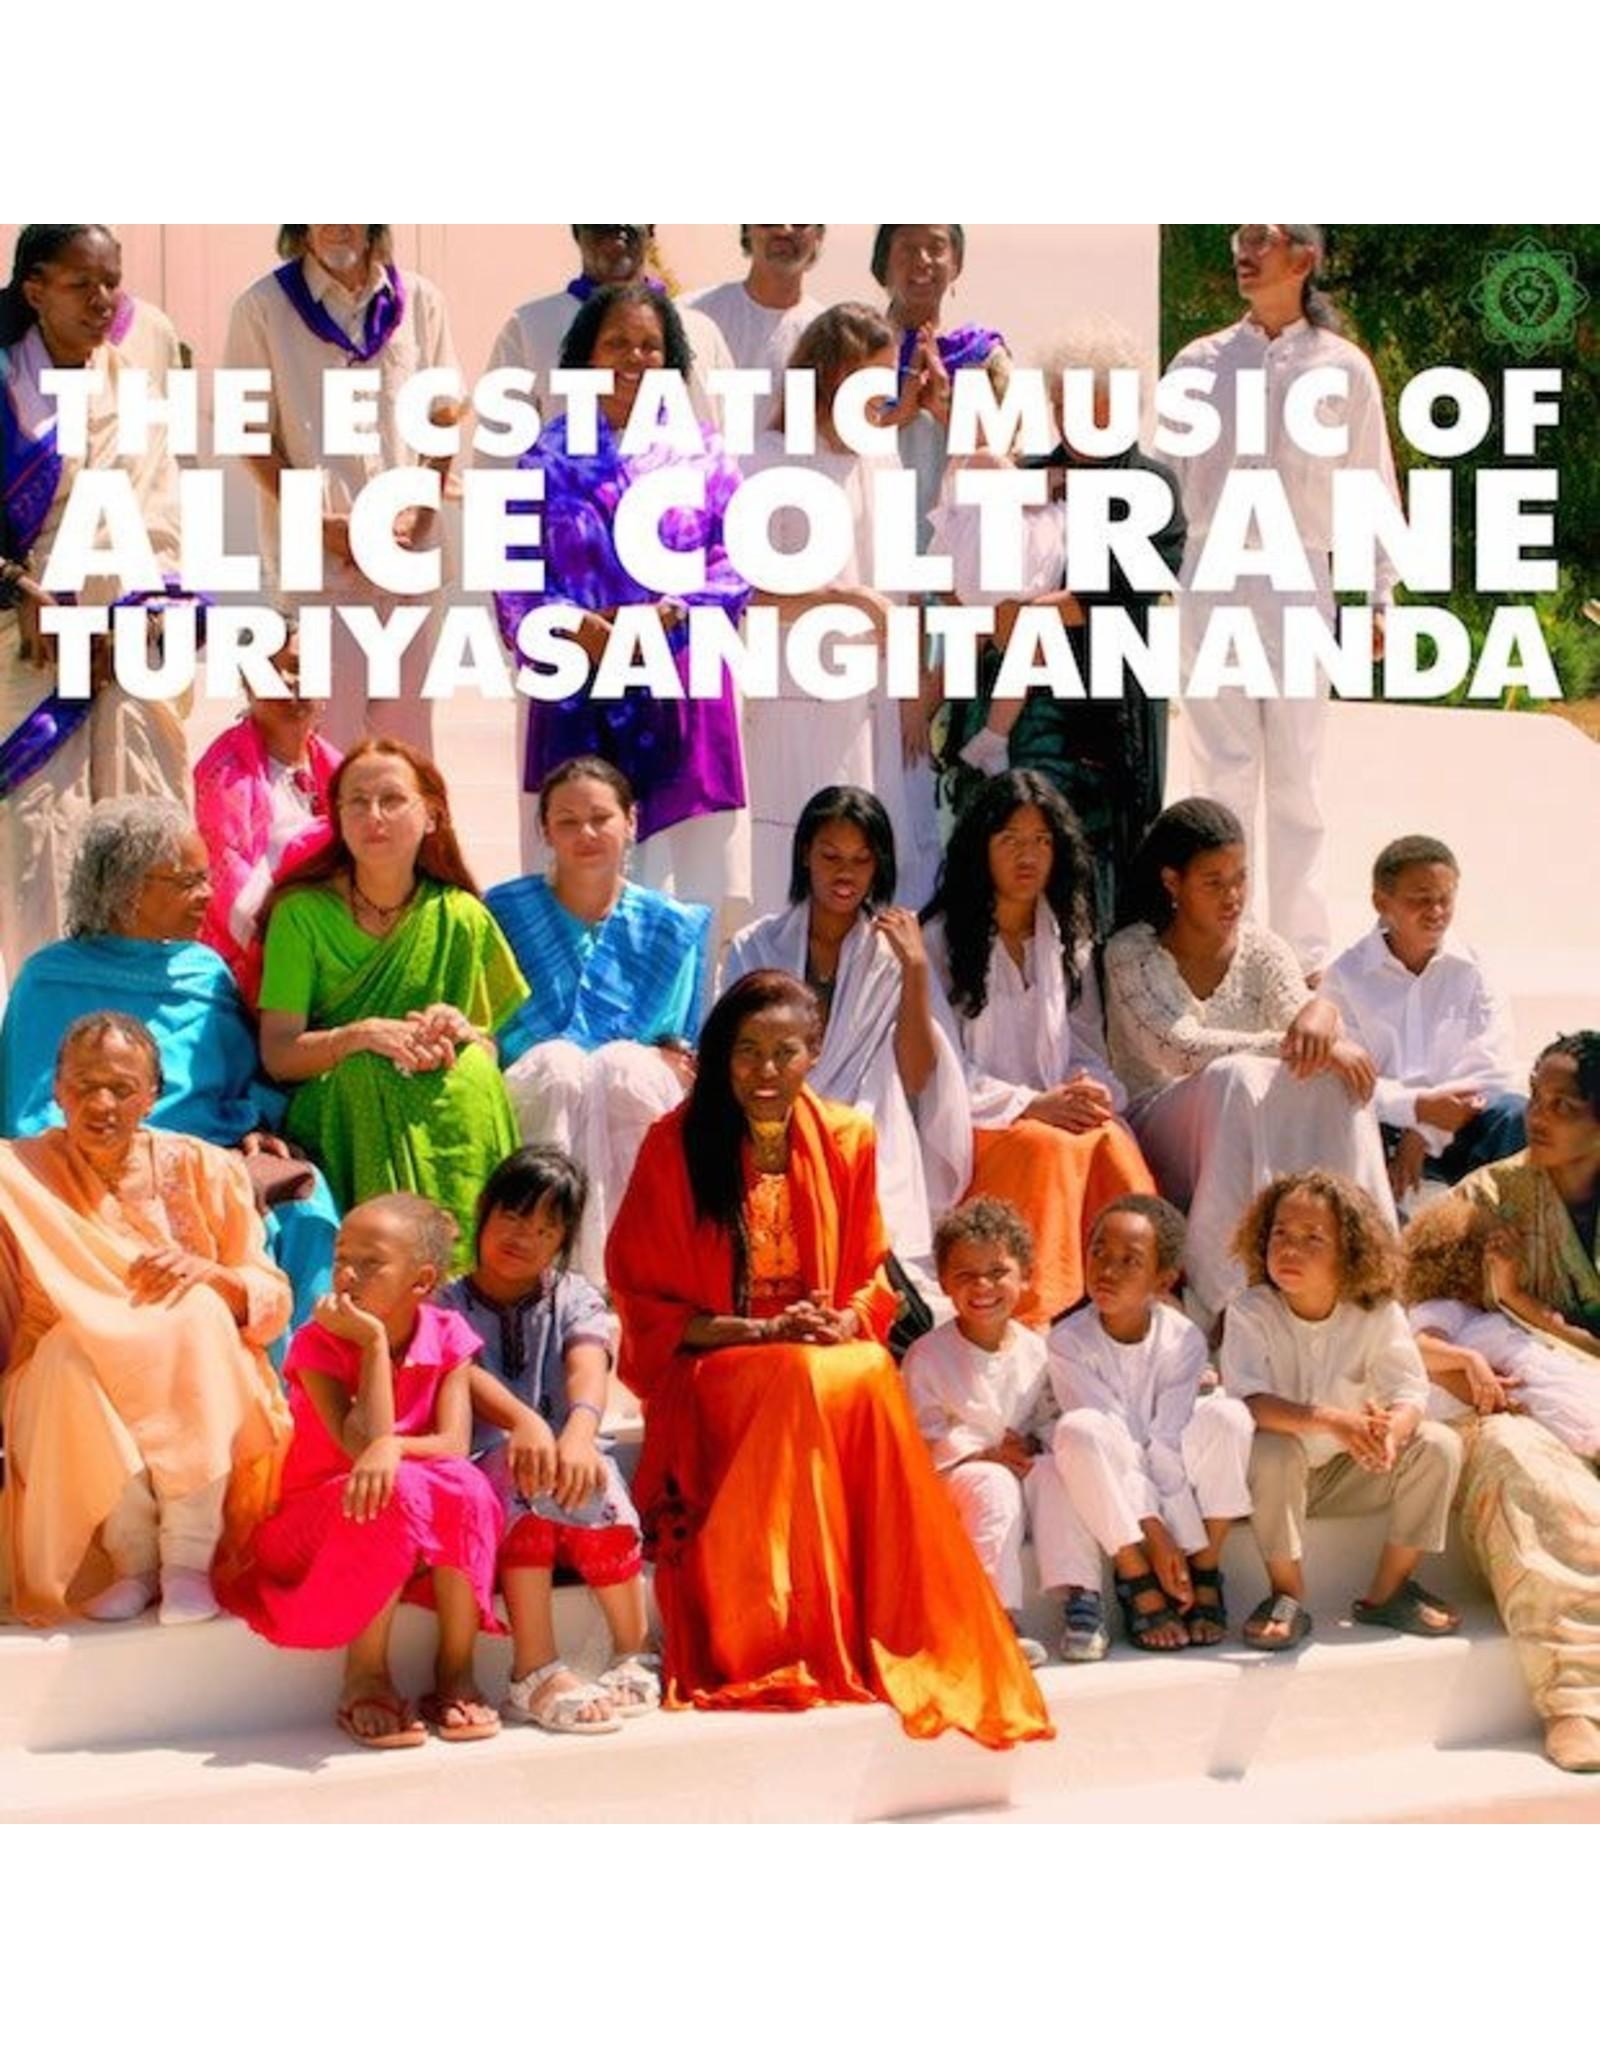 New Vinyl Alice Coltrane - World Spirituality Classics 1: The Ecstatic Music Of Alice Coltrane 2LP